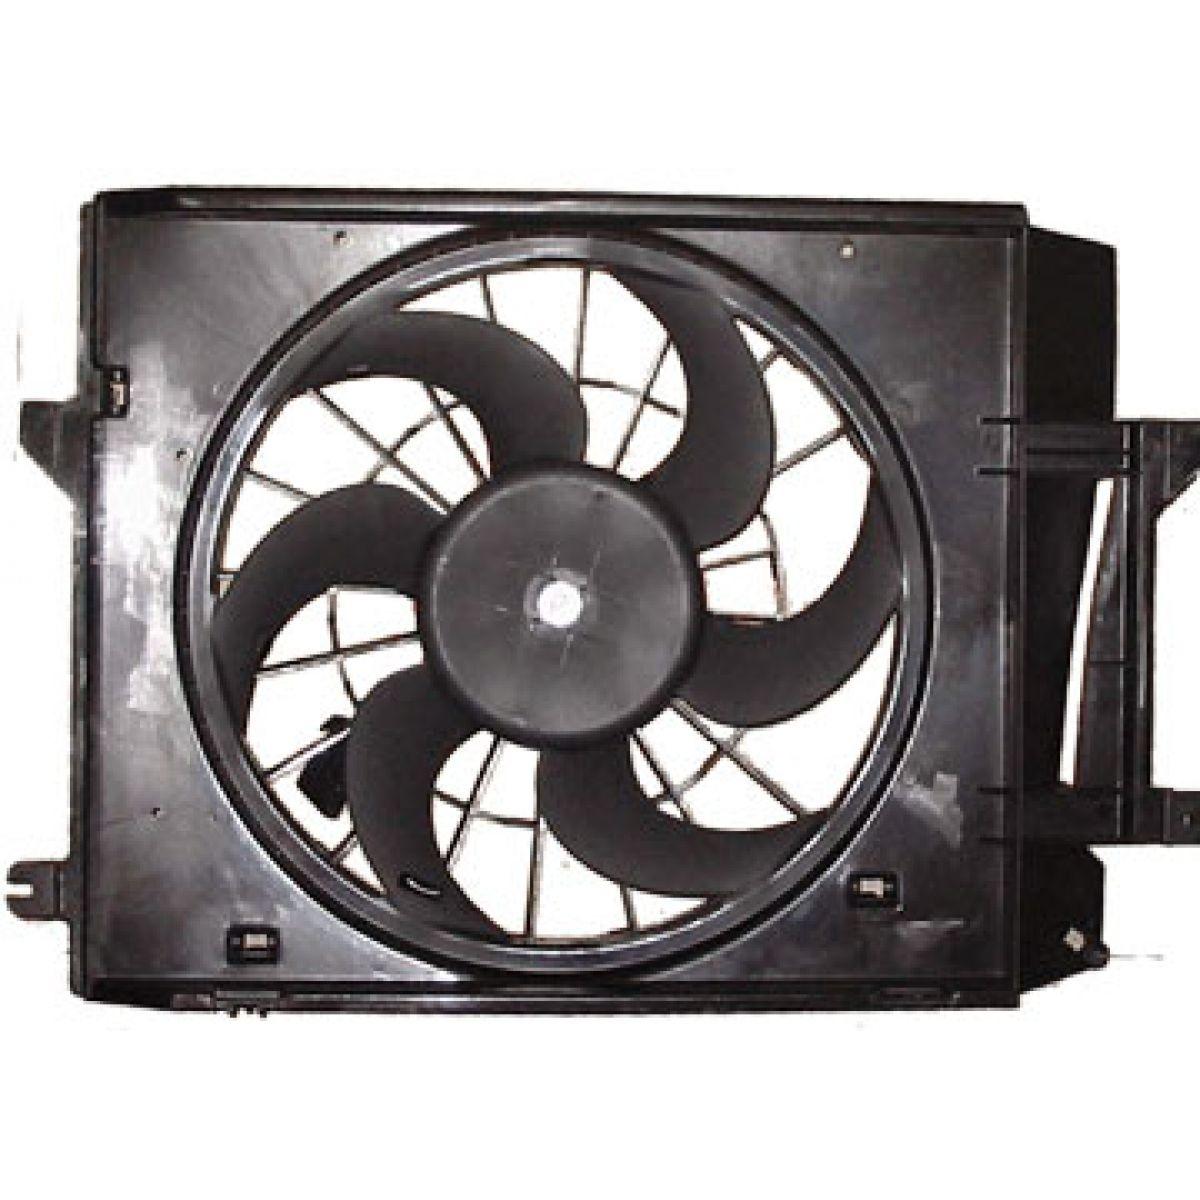 02 Cool Fan : Radiator cooling fan assembly for nissan quest